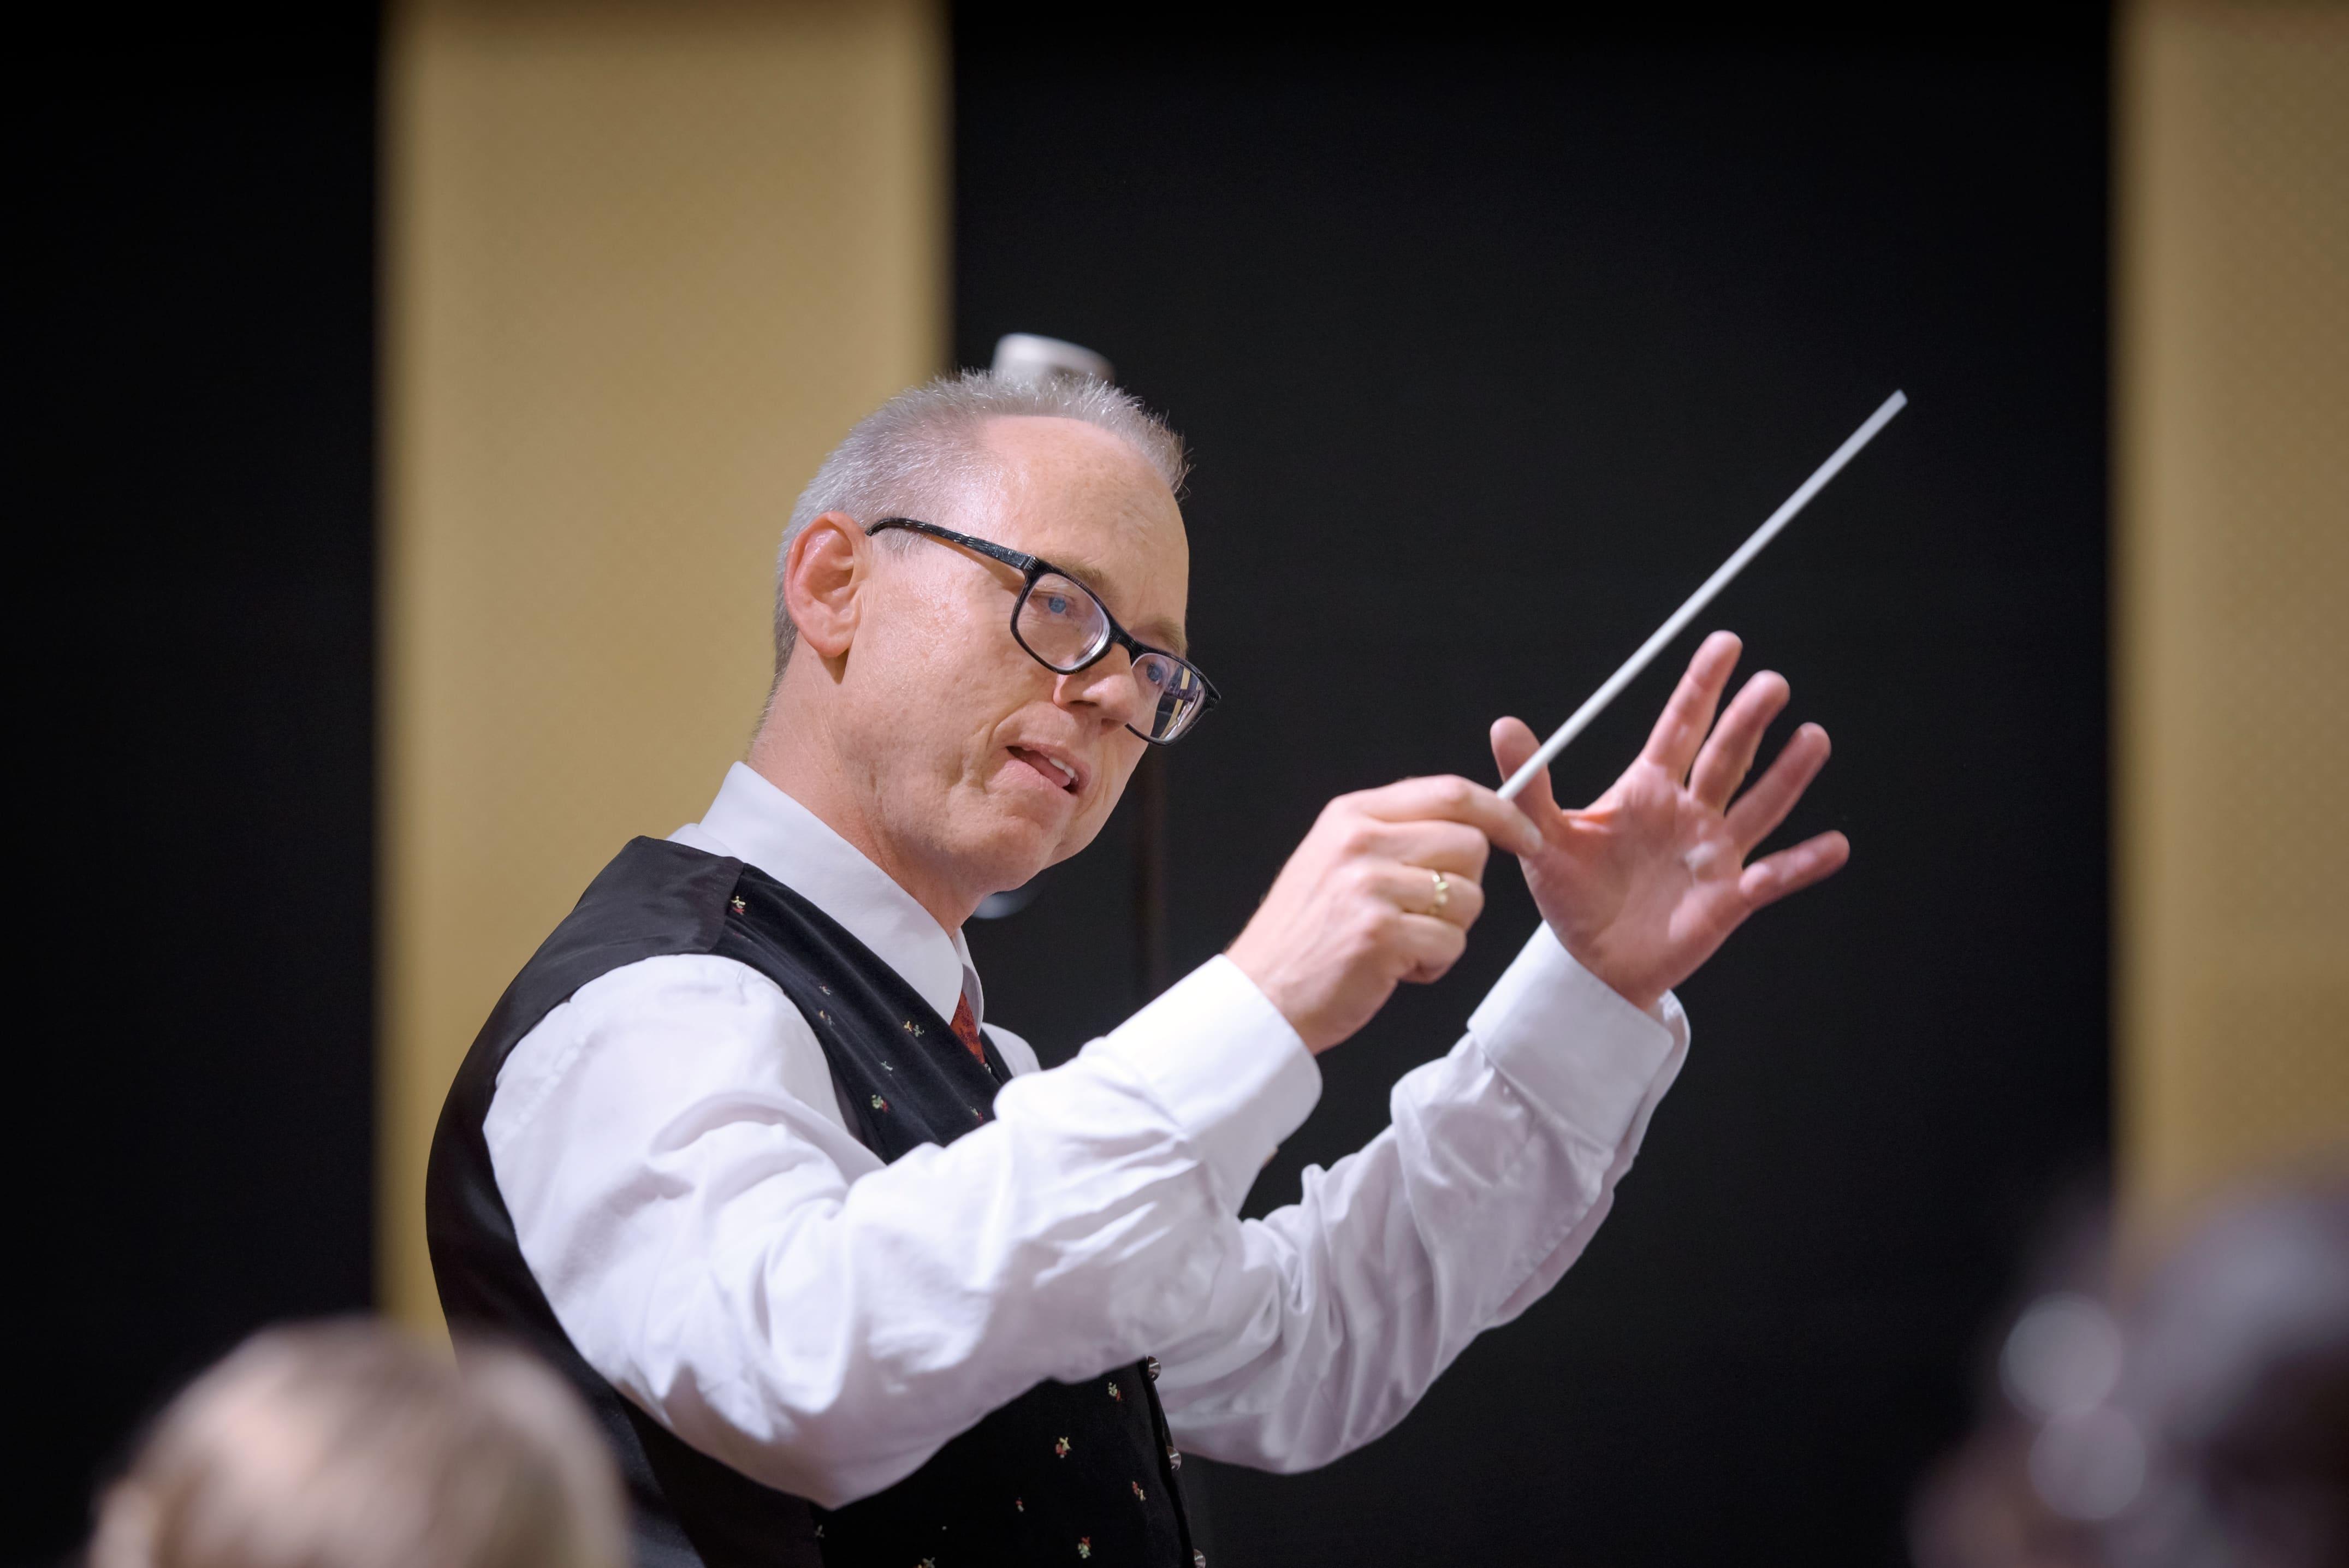 Dirigent der TMK Flachau